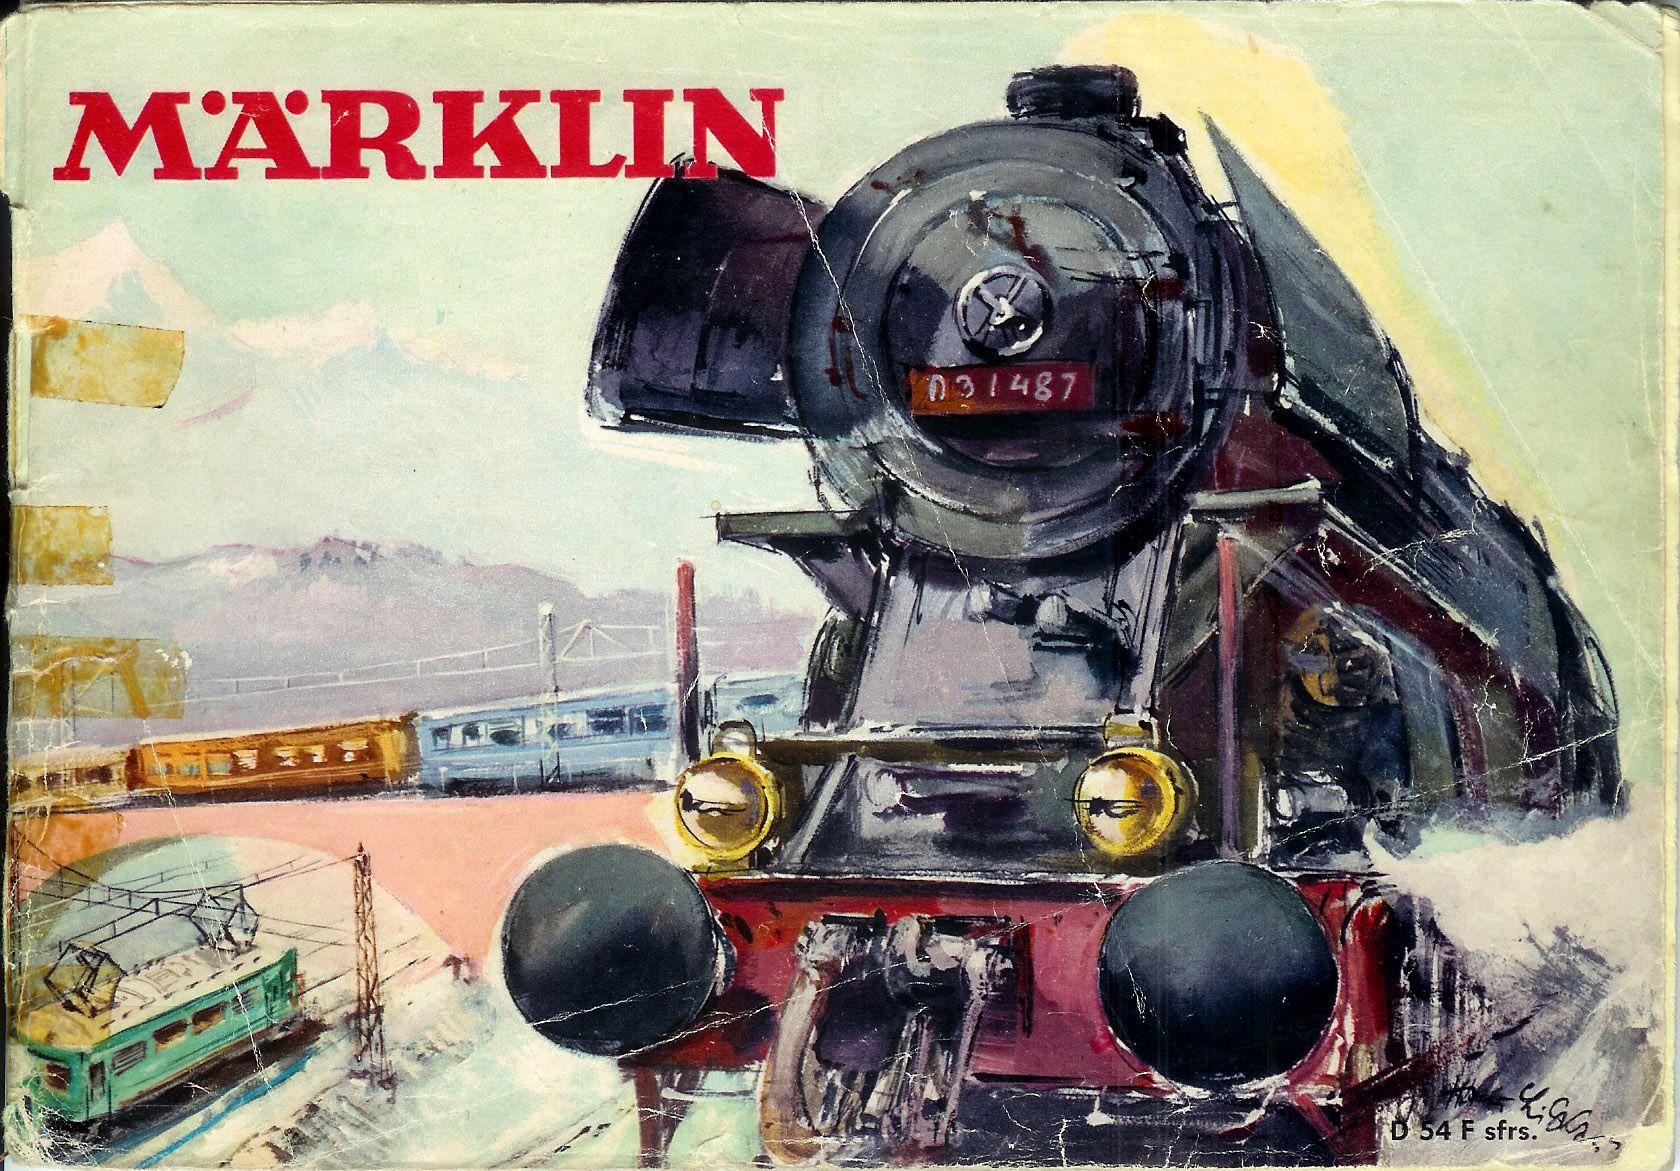 Marklin catalogue 1954